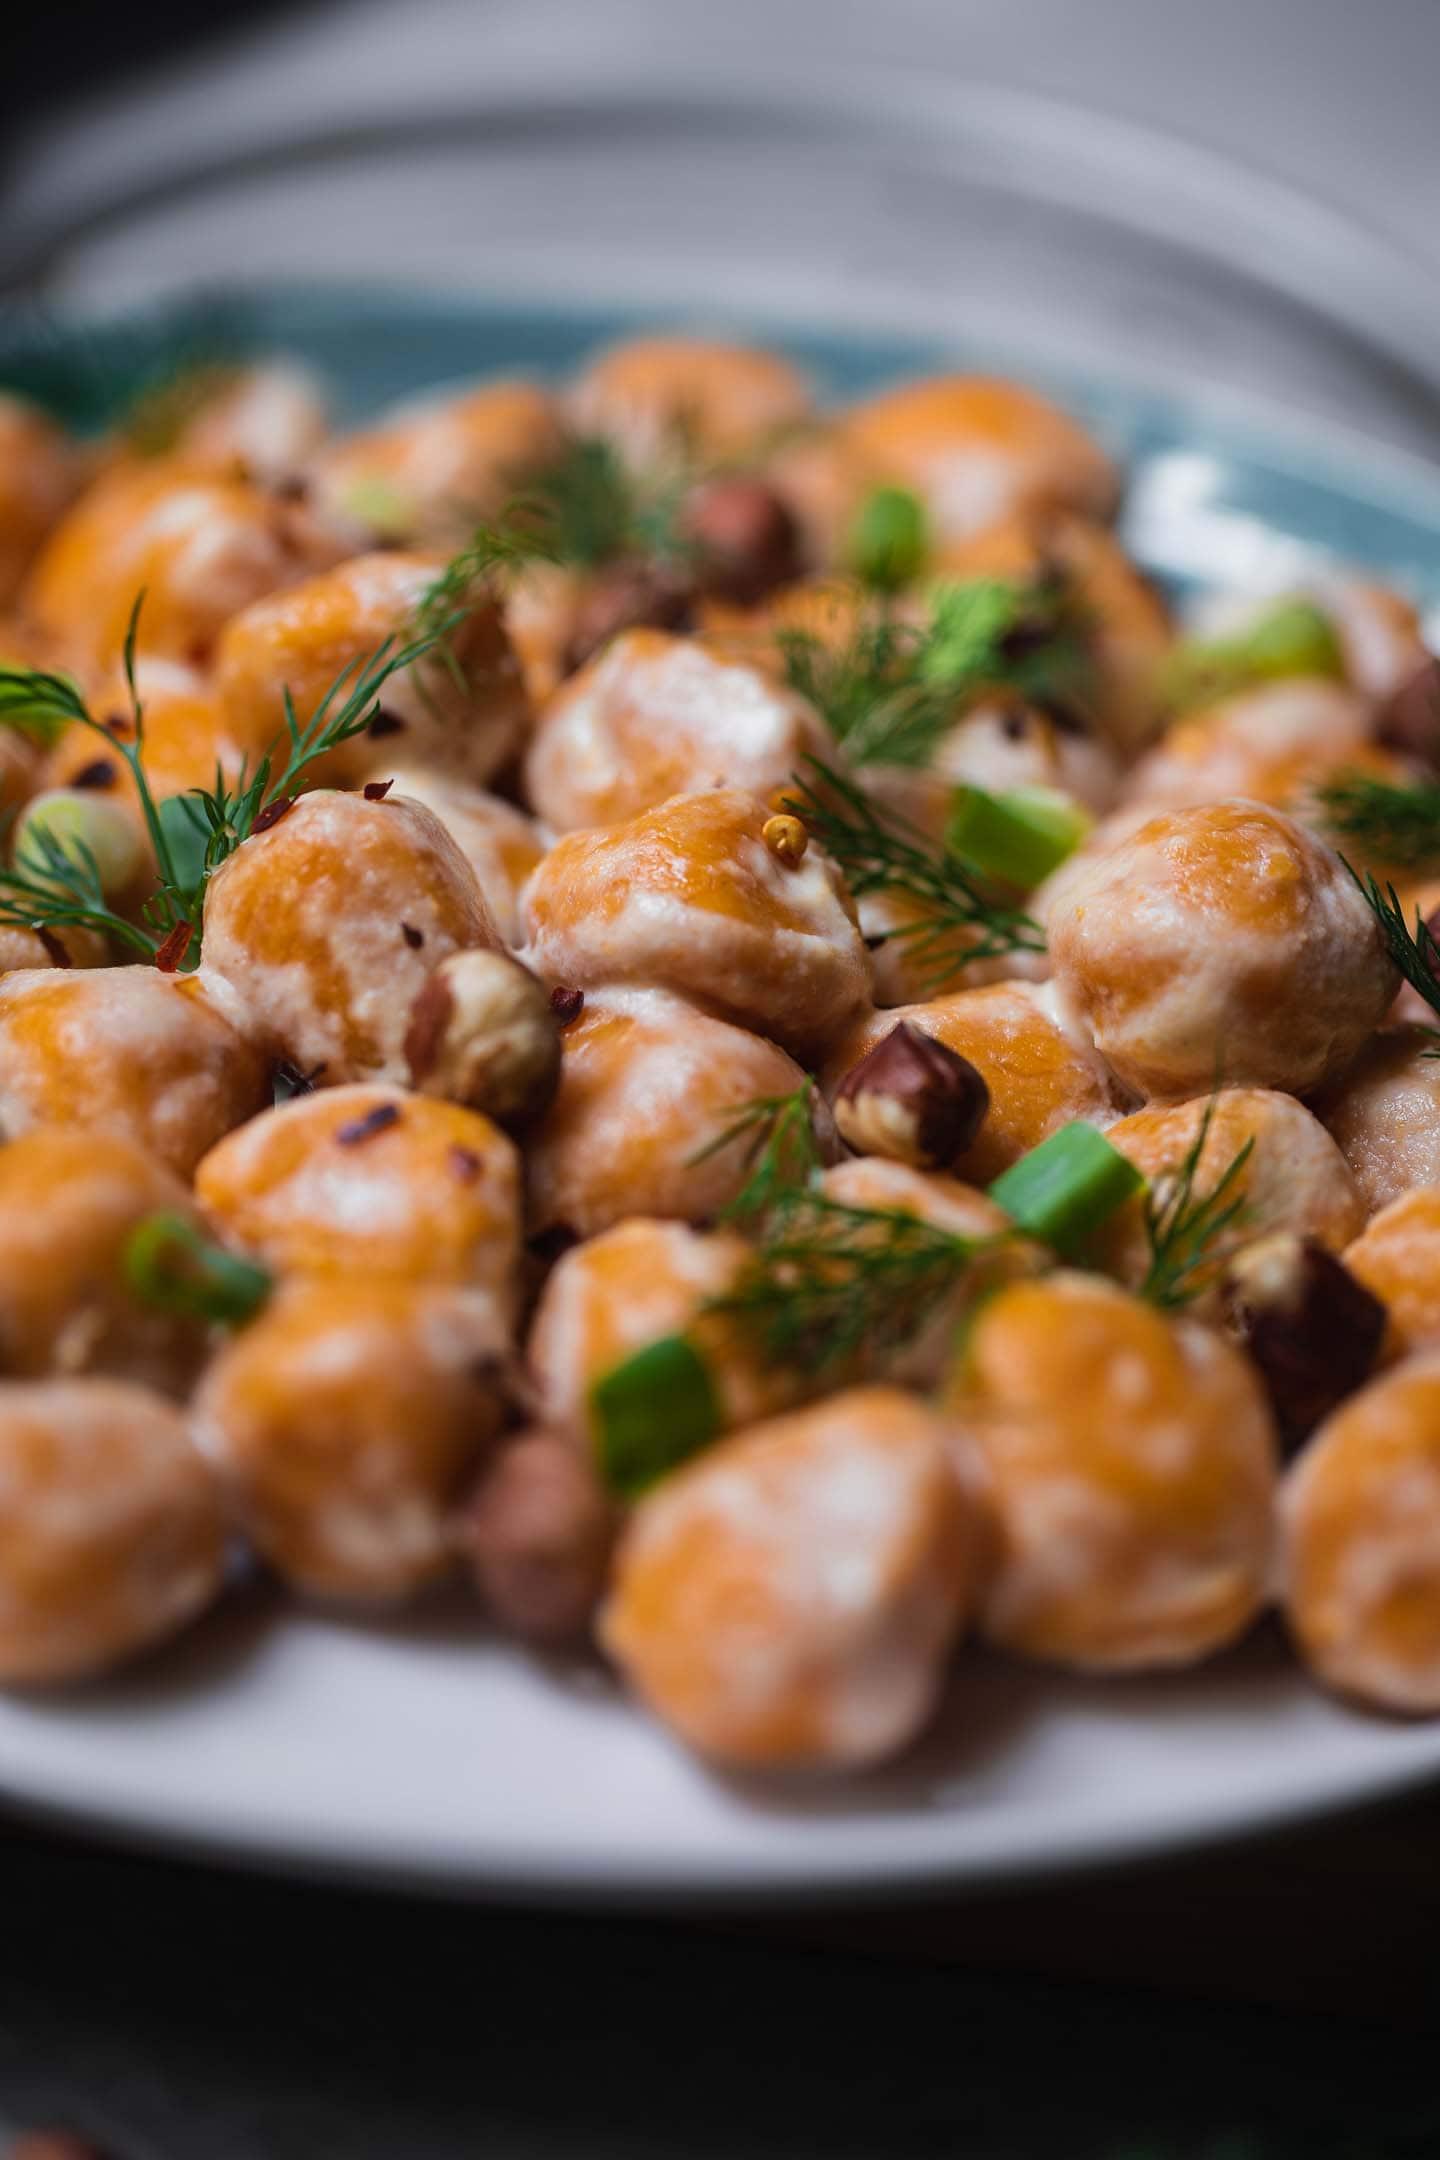 Sweet potato gnocchi on a white plate